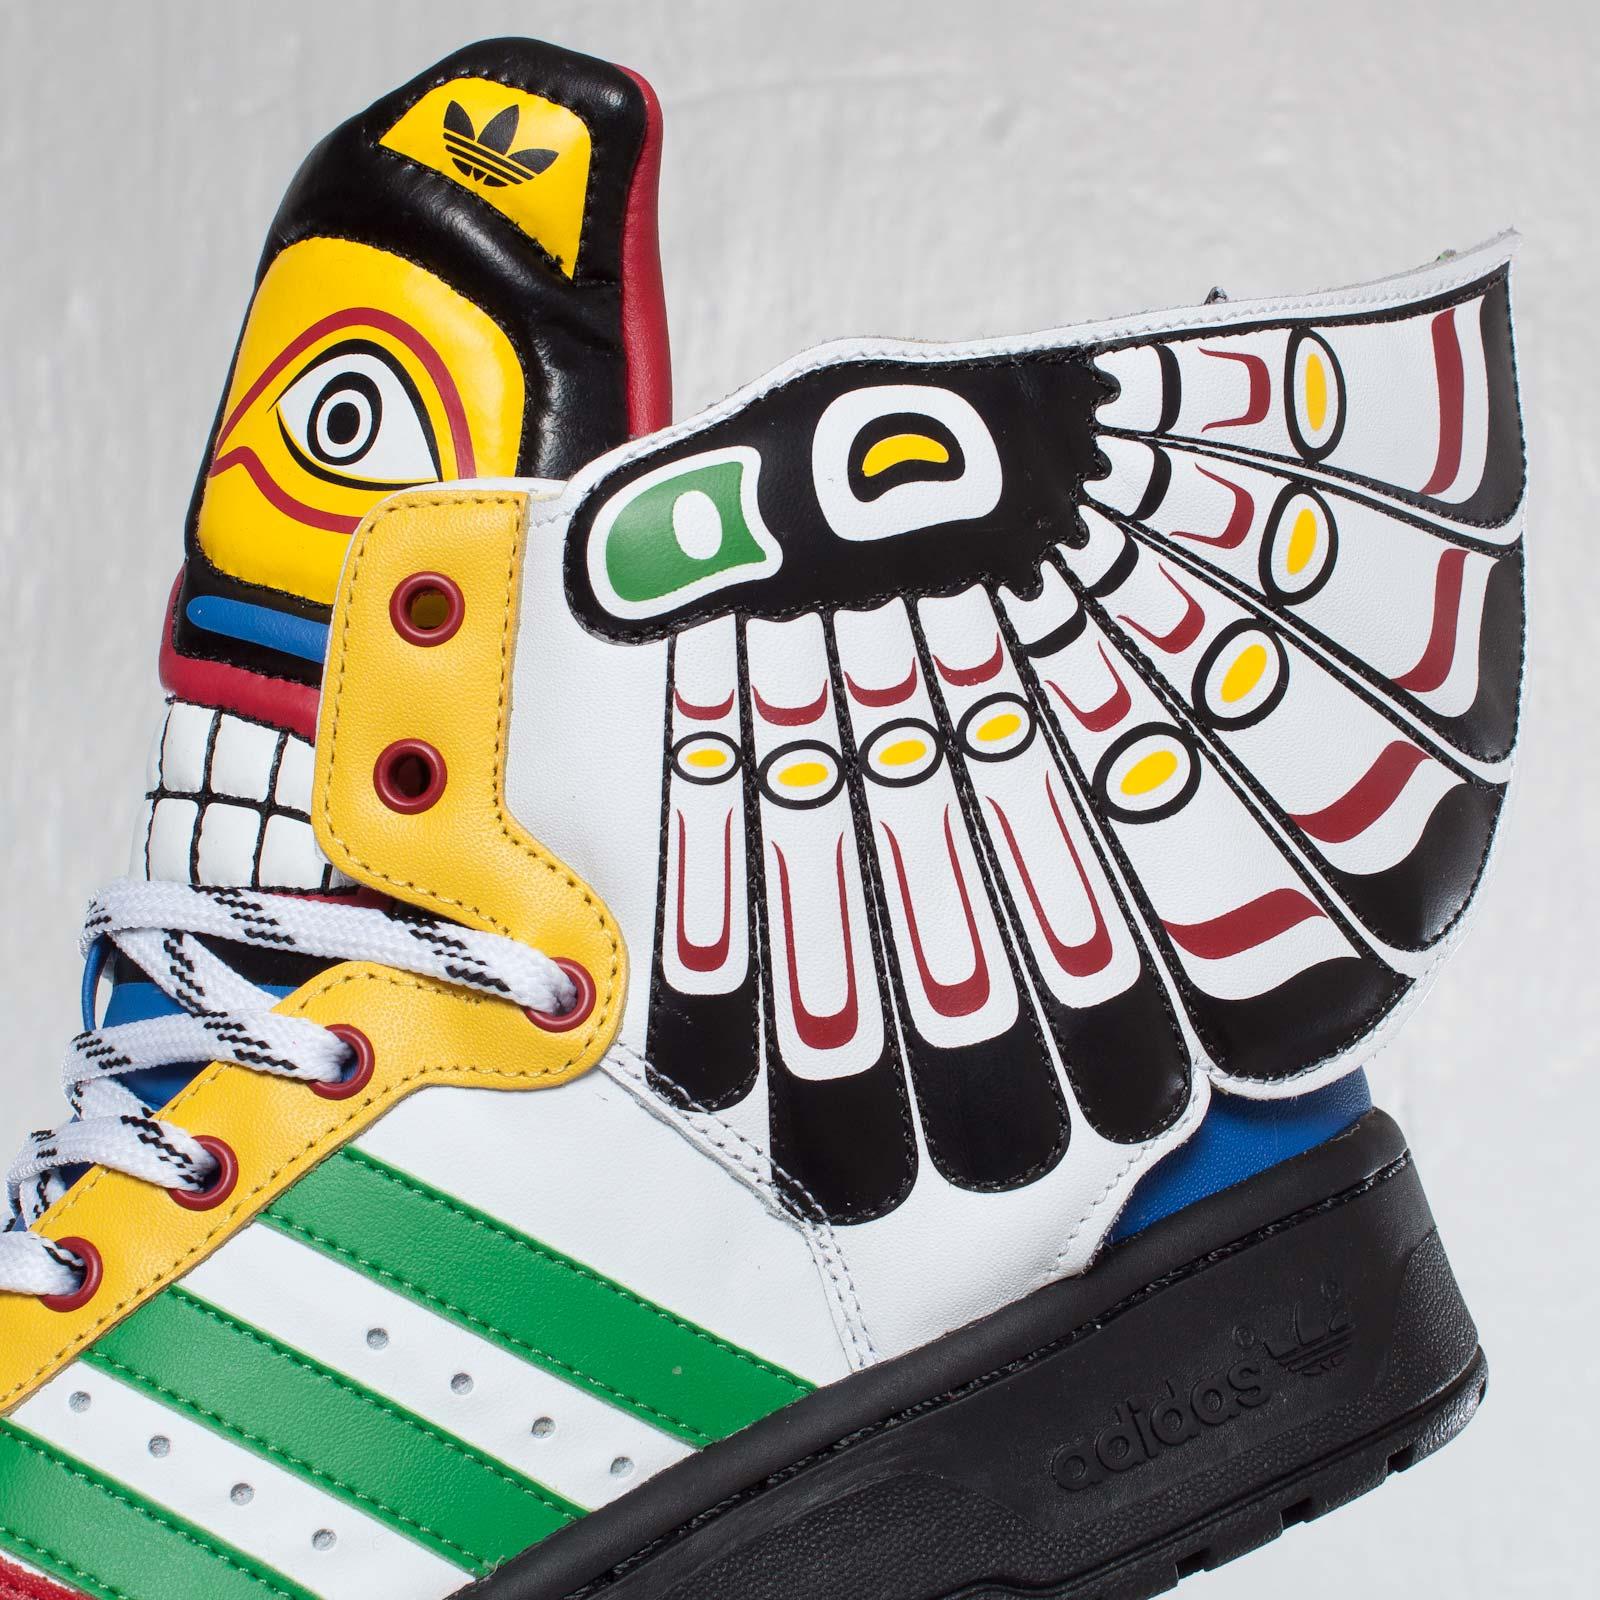 adidas JS Eagle Wing - Q23171 - Sneakersnstuff  fbe602d0e778